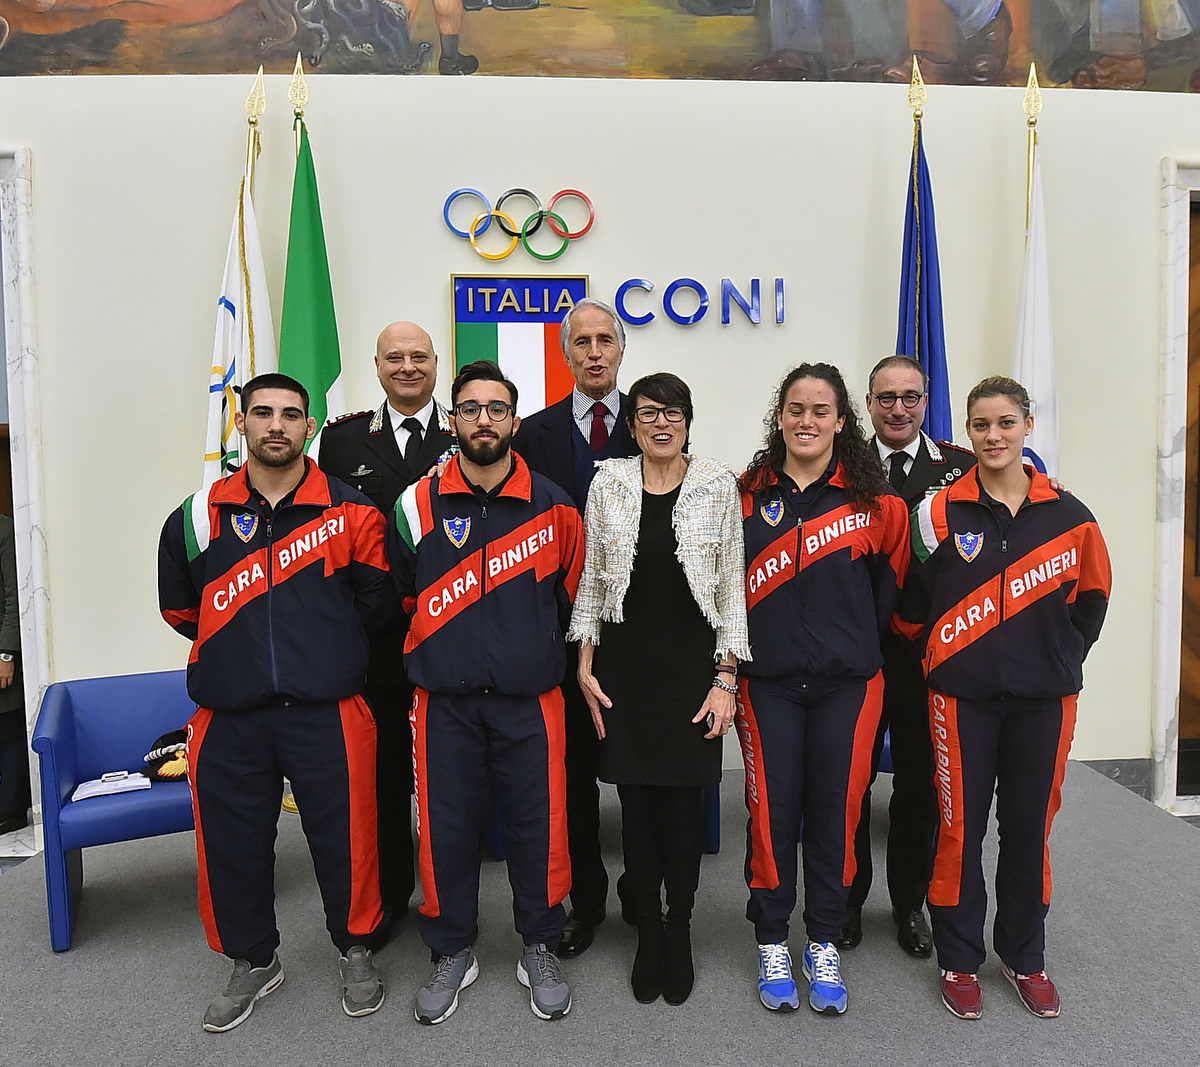 DI CENTA OLYMPIC CHANNEL foto mezzelani gmt070